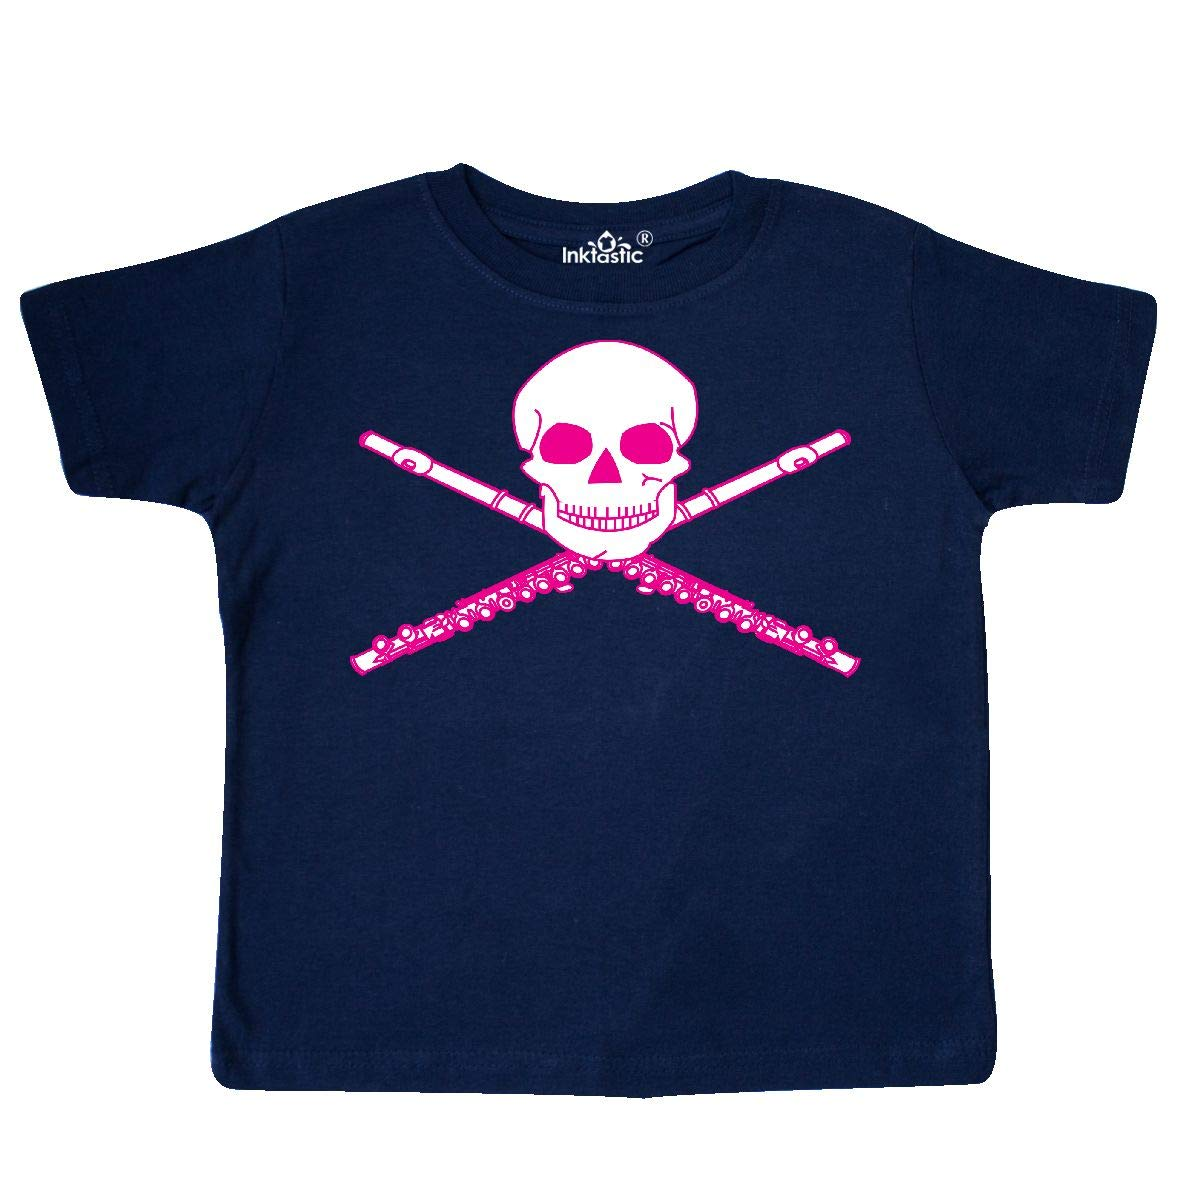 inktastic Flute Pirate Skull Crossbones Toddler T-Shirt